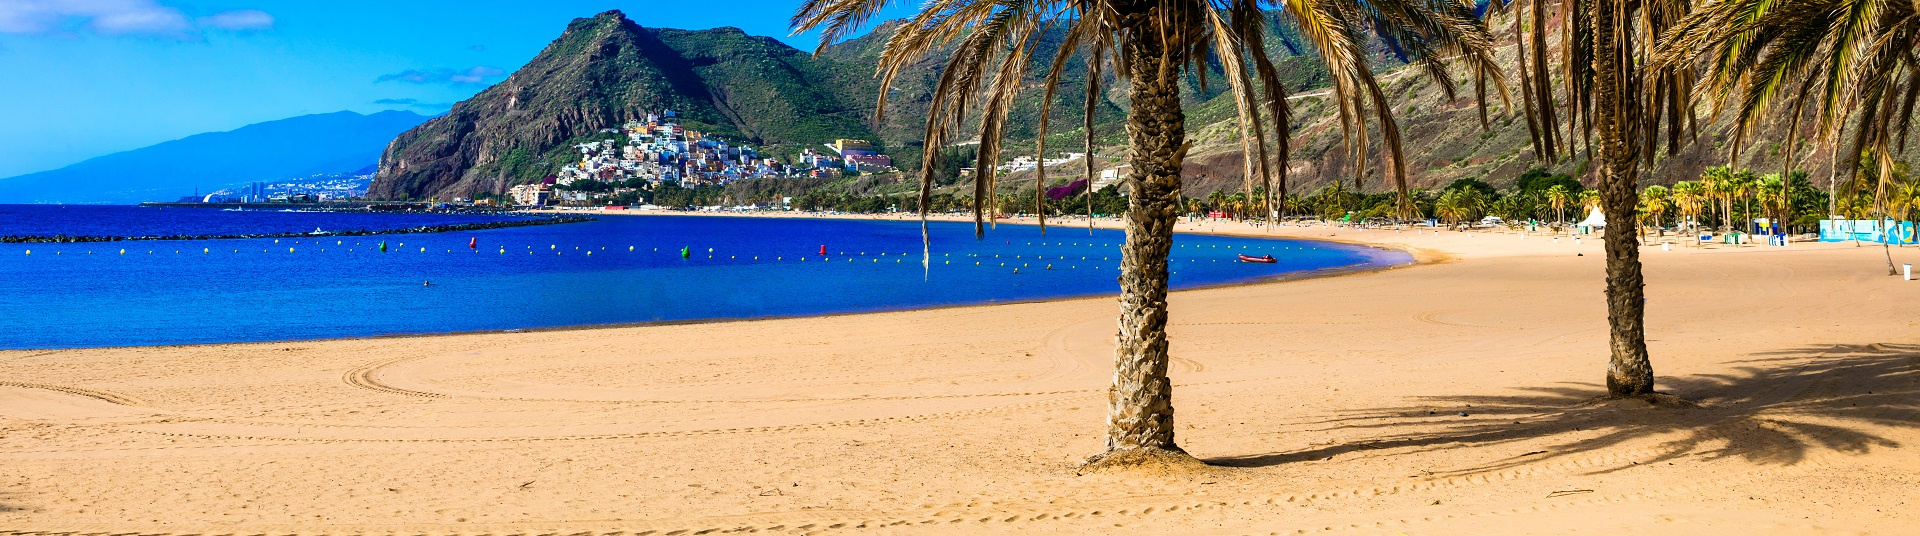 Week-end pas cher Santa Cruz de Tenerife